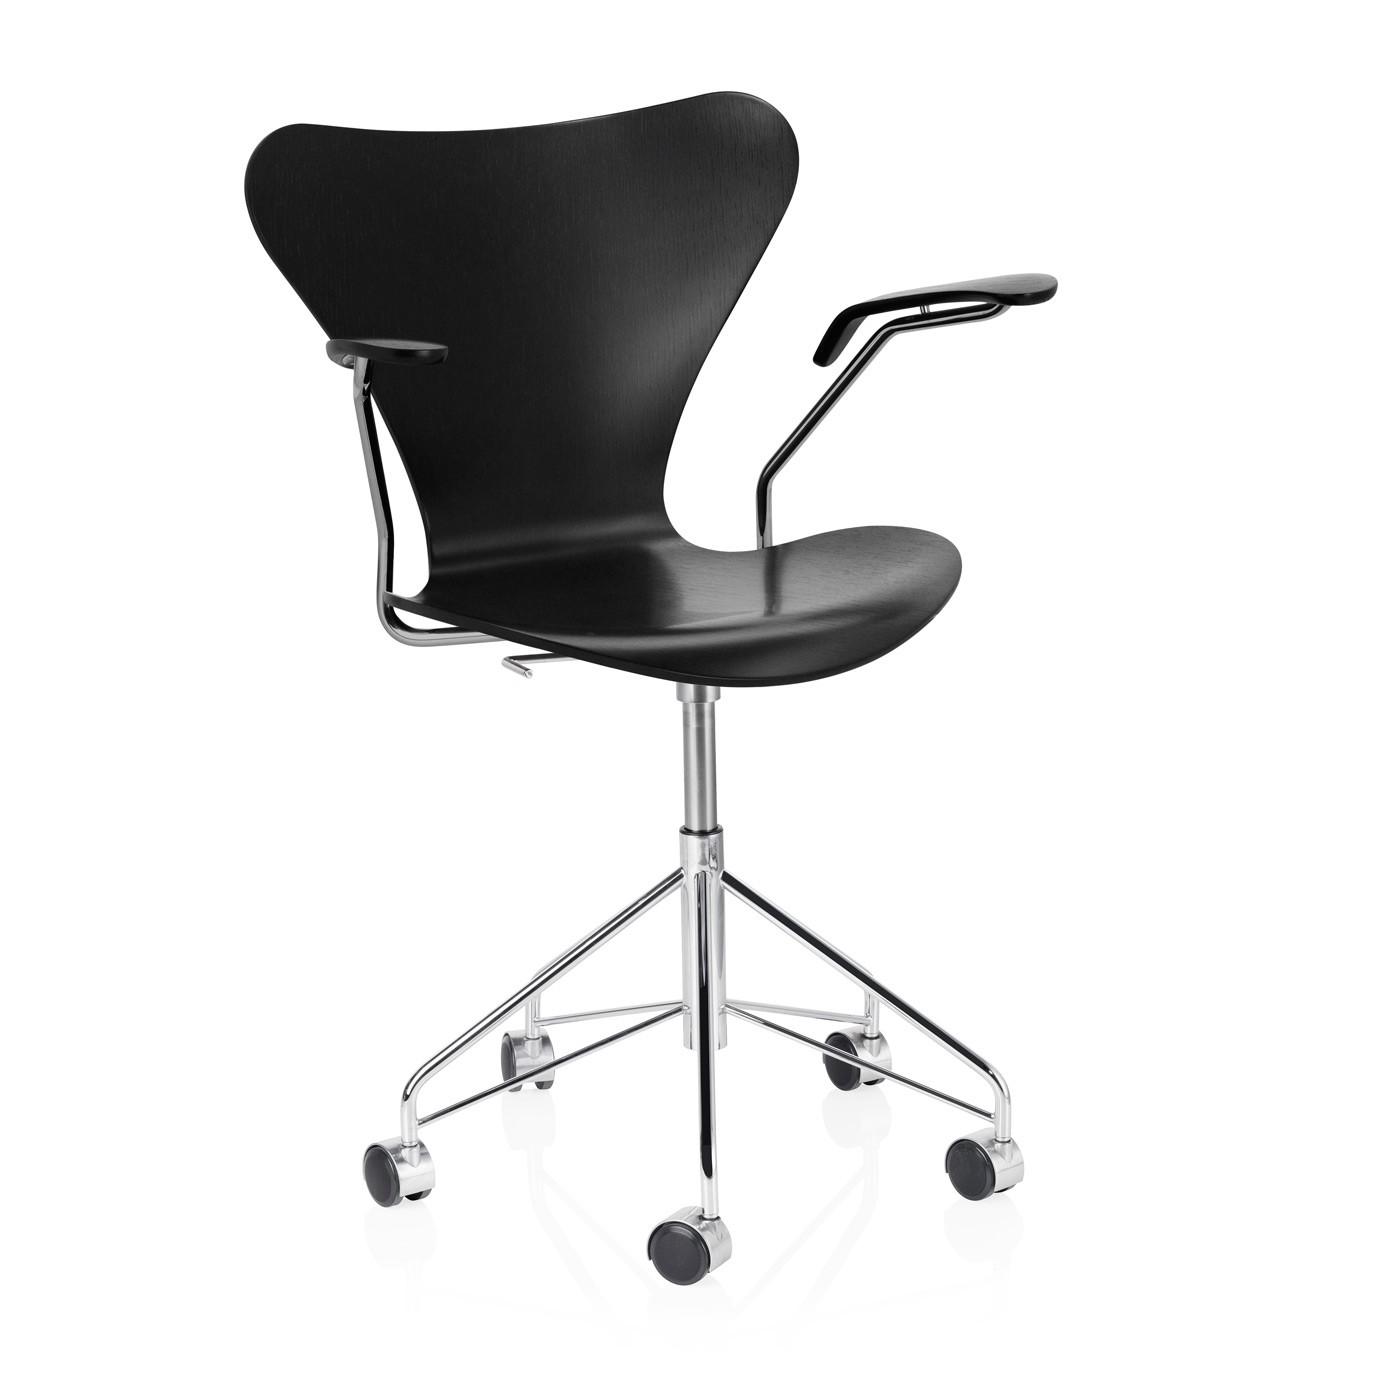 Series 7 office chair by Arne Jacobsen Fritz Hansen La boutique